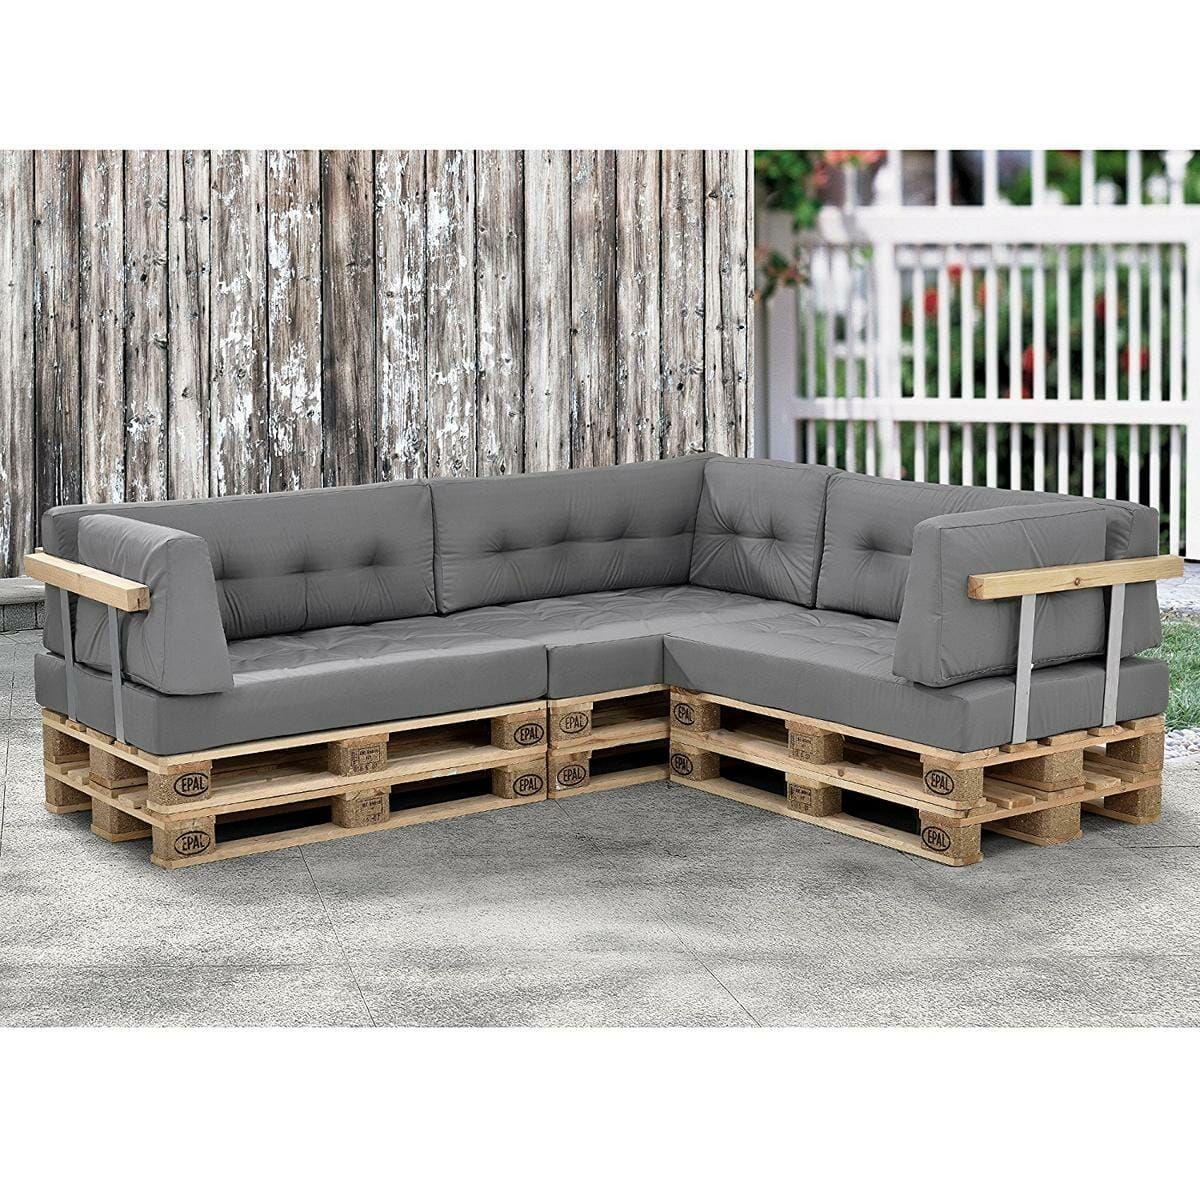 Palettenkissen Shop Palettenpolster Outdoor Sets Kaufen Paletten Kissen Paletten Couch Holzpaletten Möbel